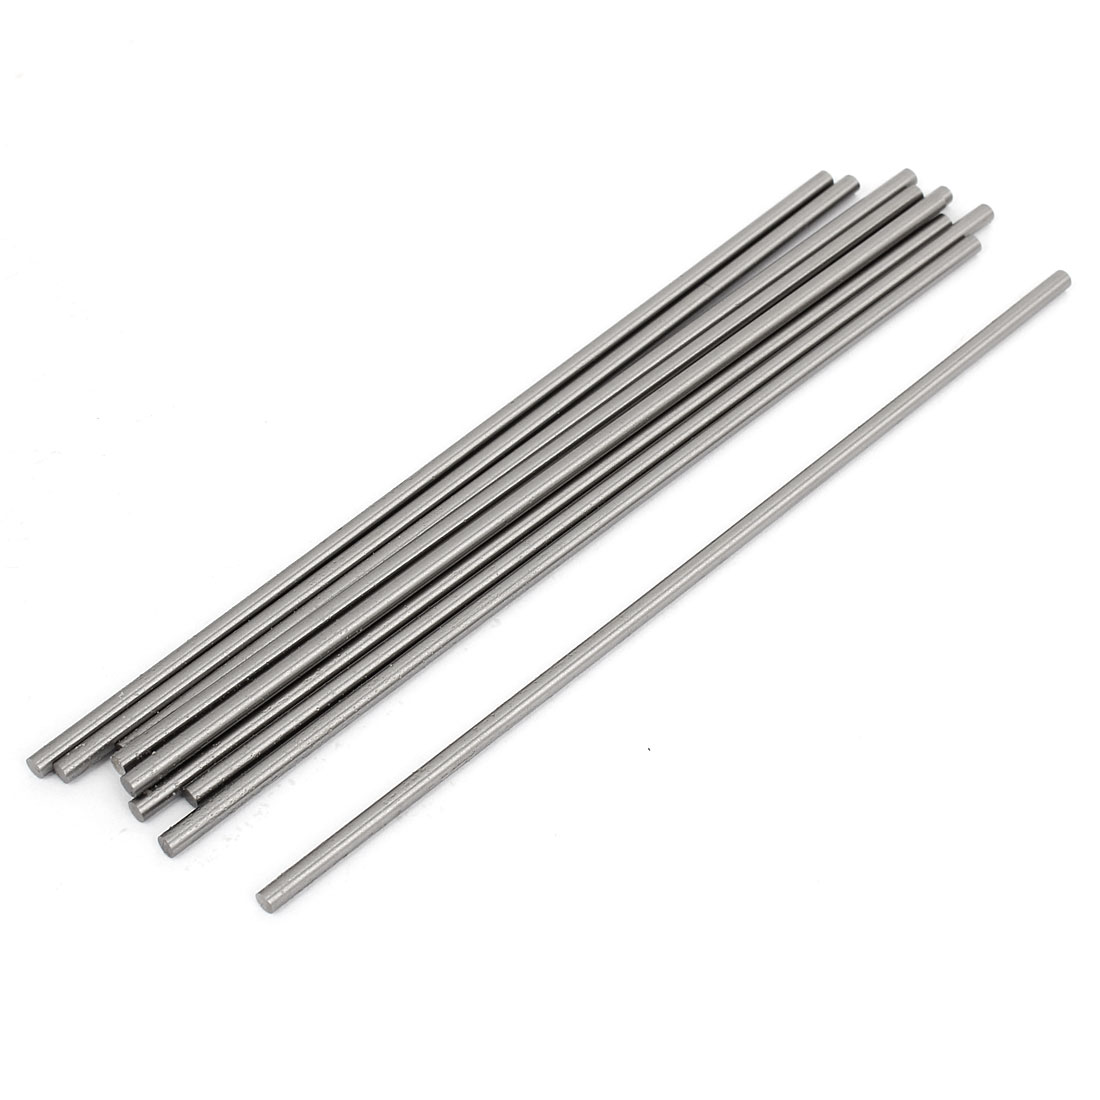 10pcs HSS High Speed Steel Round Turning Lathe Bars 3mm x 150mm